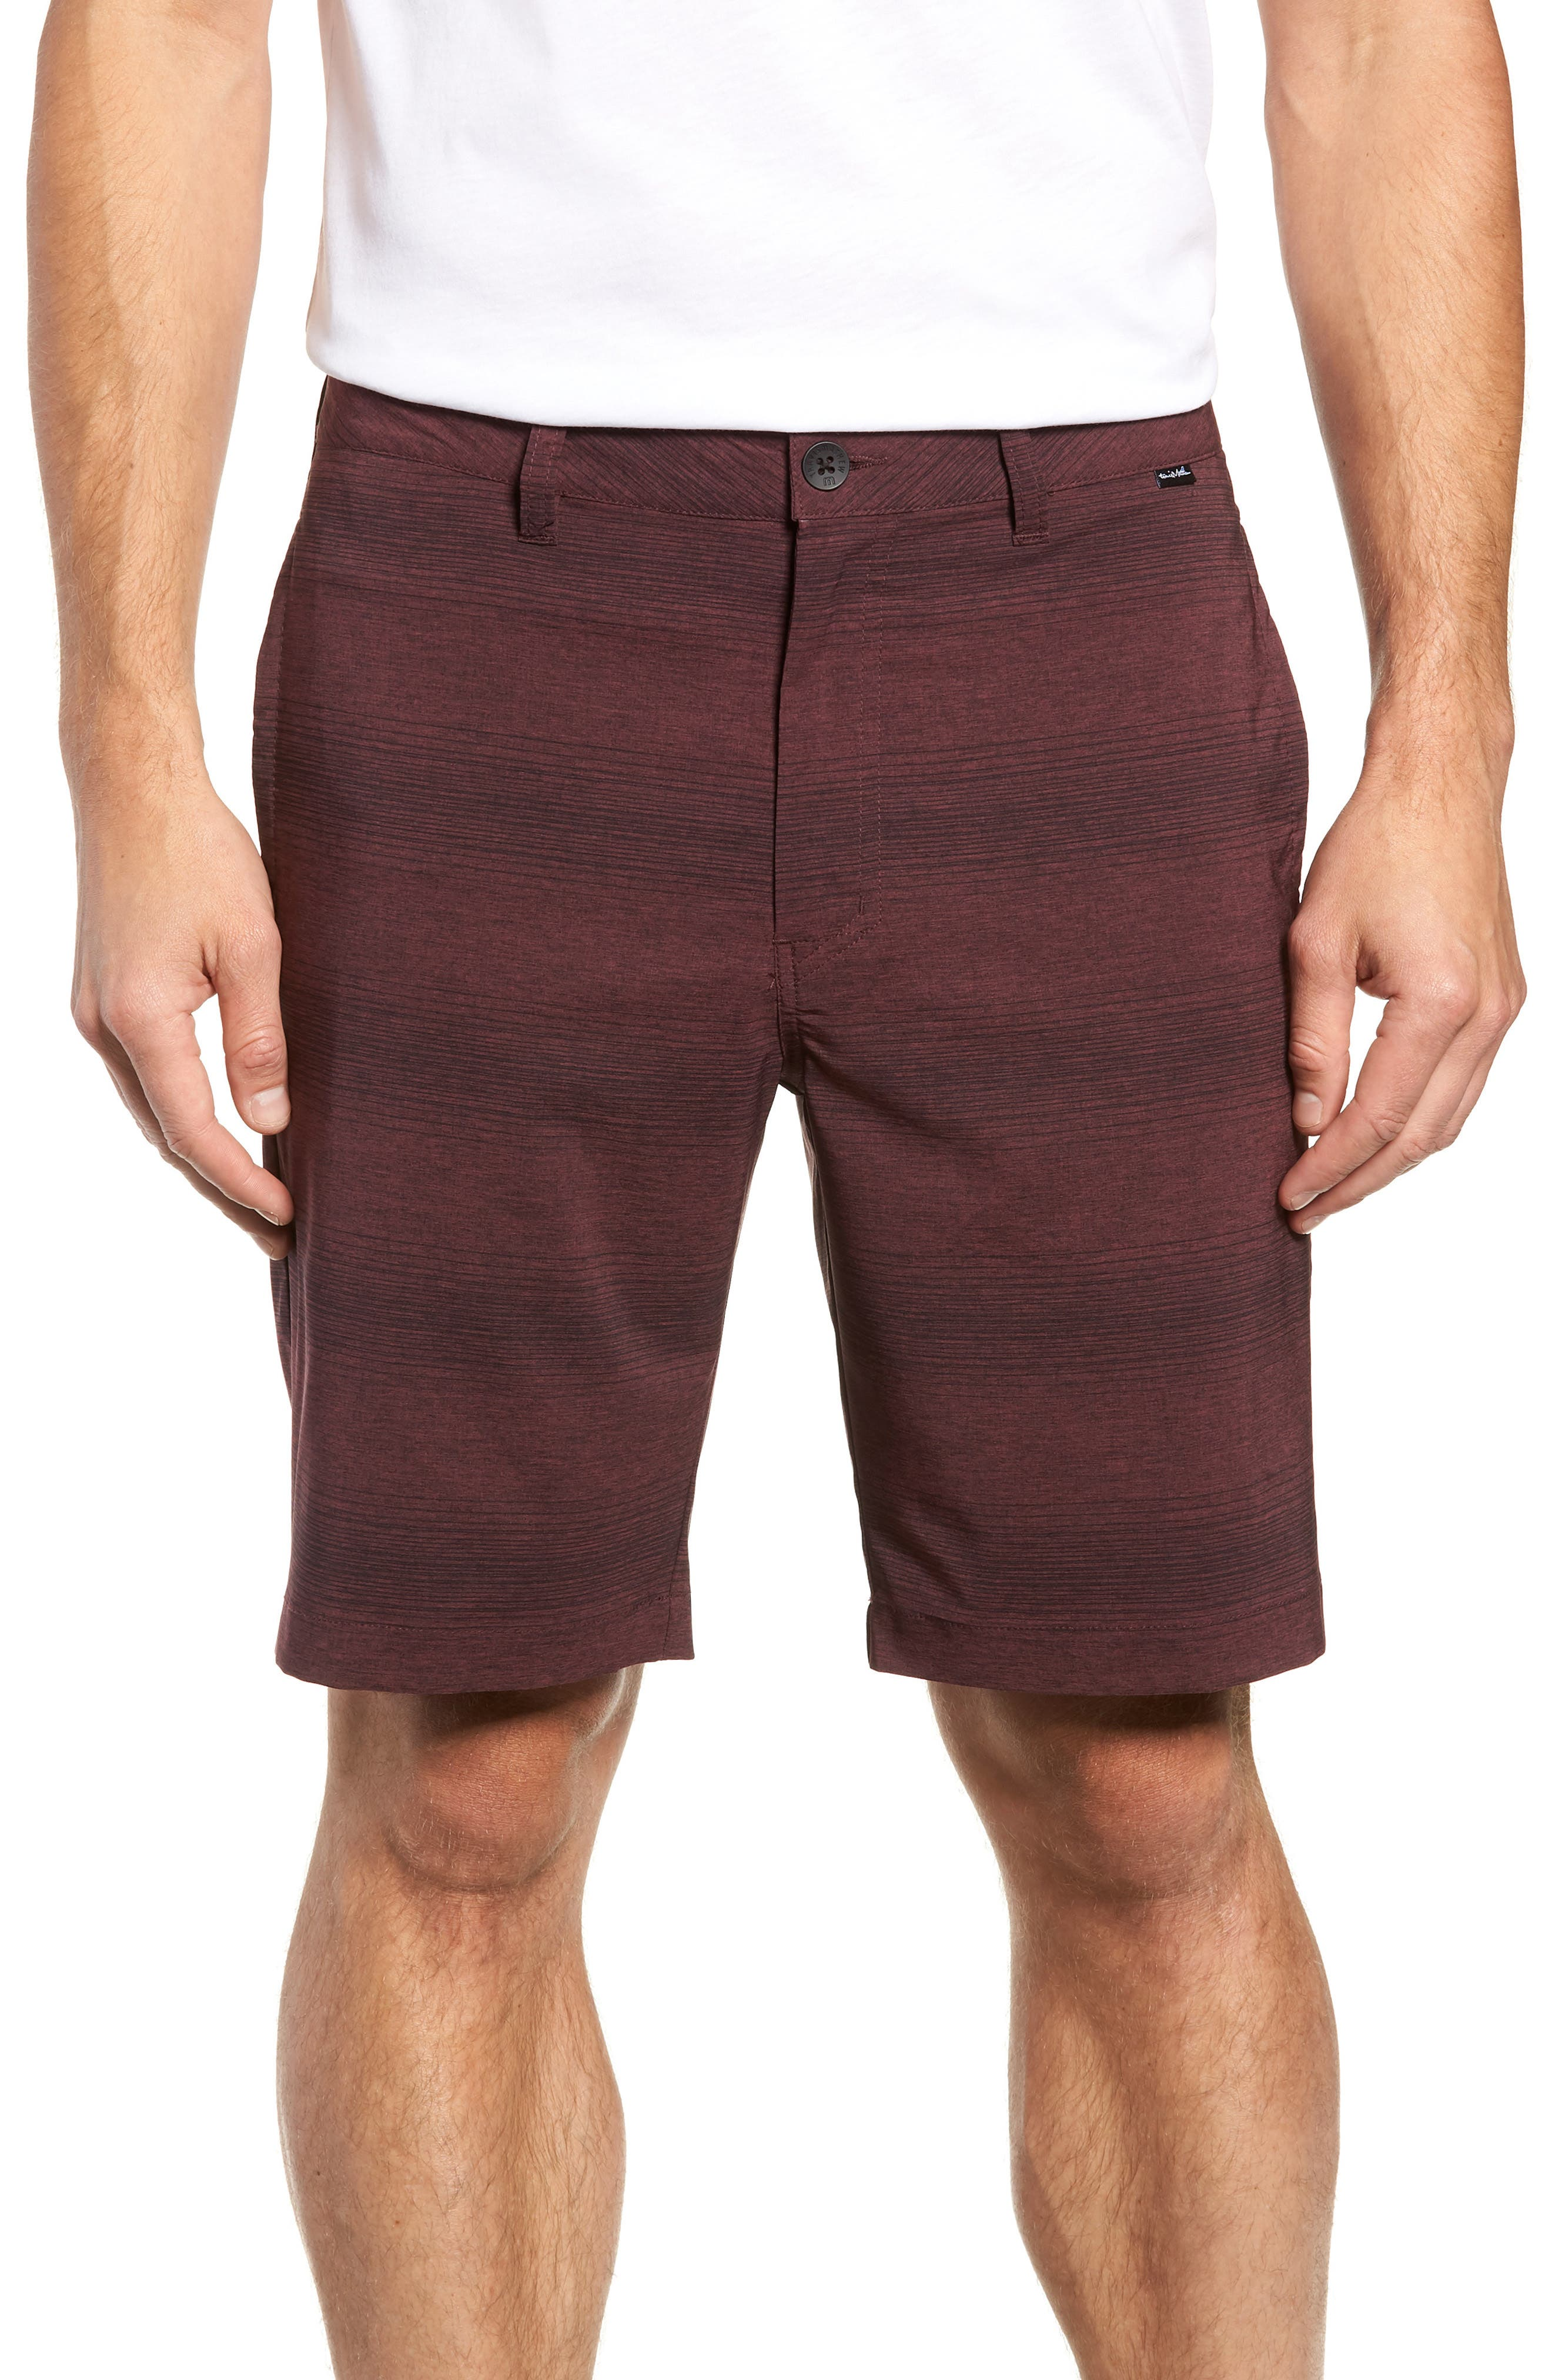 Tepic Shorts,                             Main thumbnail 1, color,                             WINETASTING/ BLACK